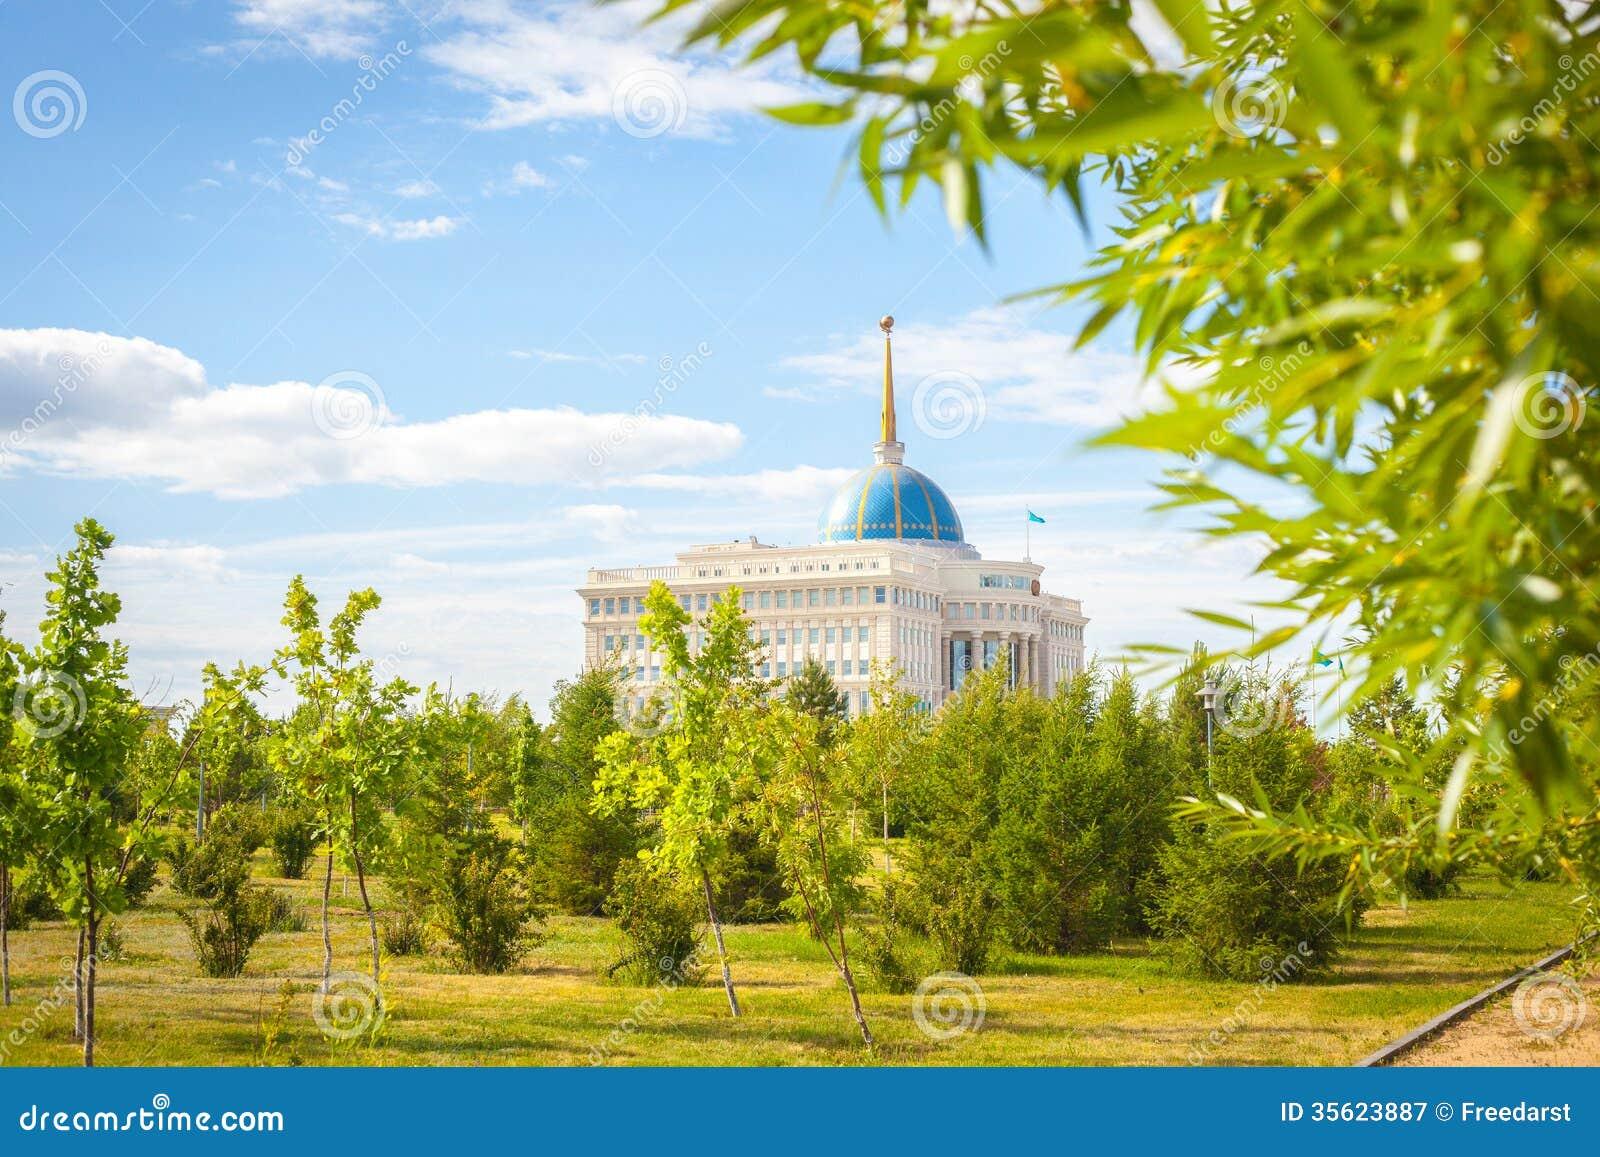 Presidente Palace de Astaná